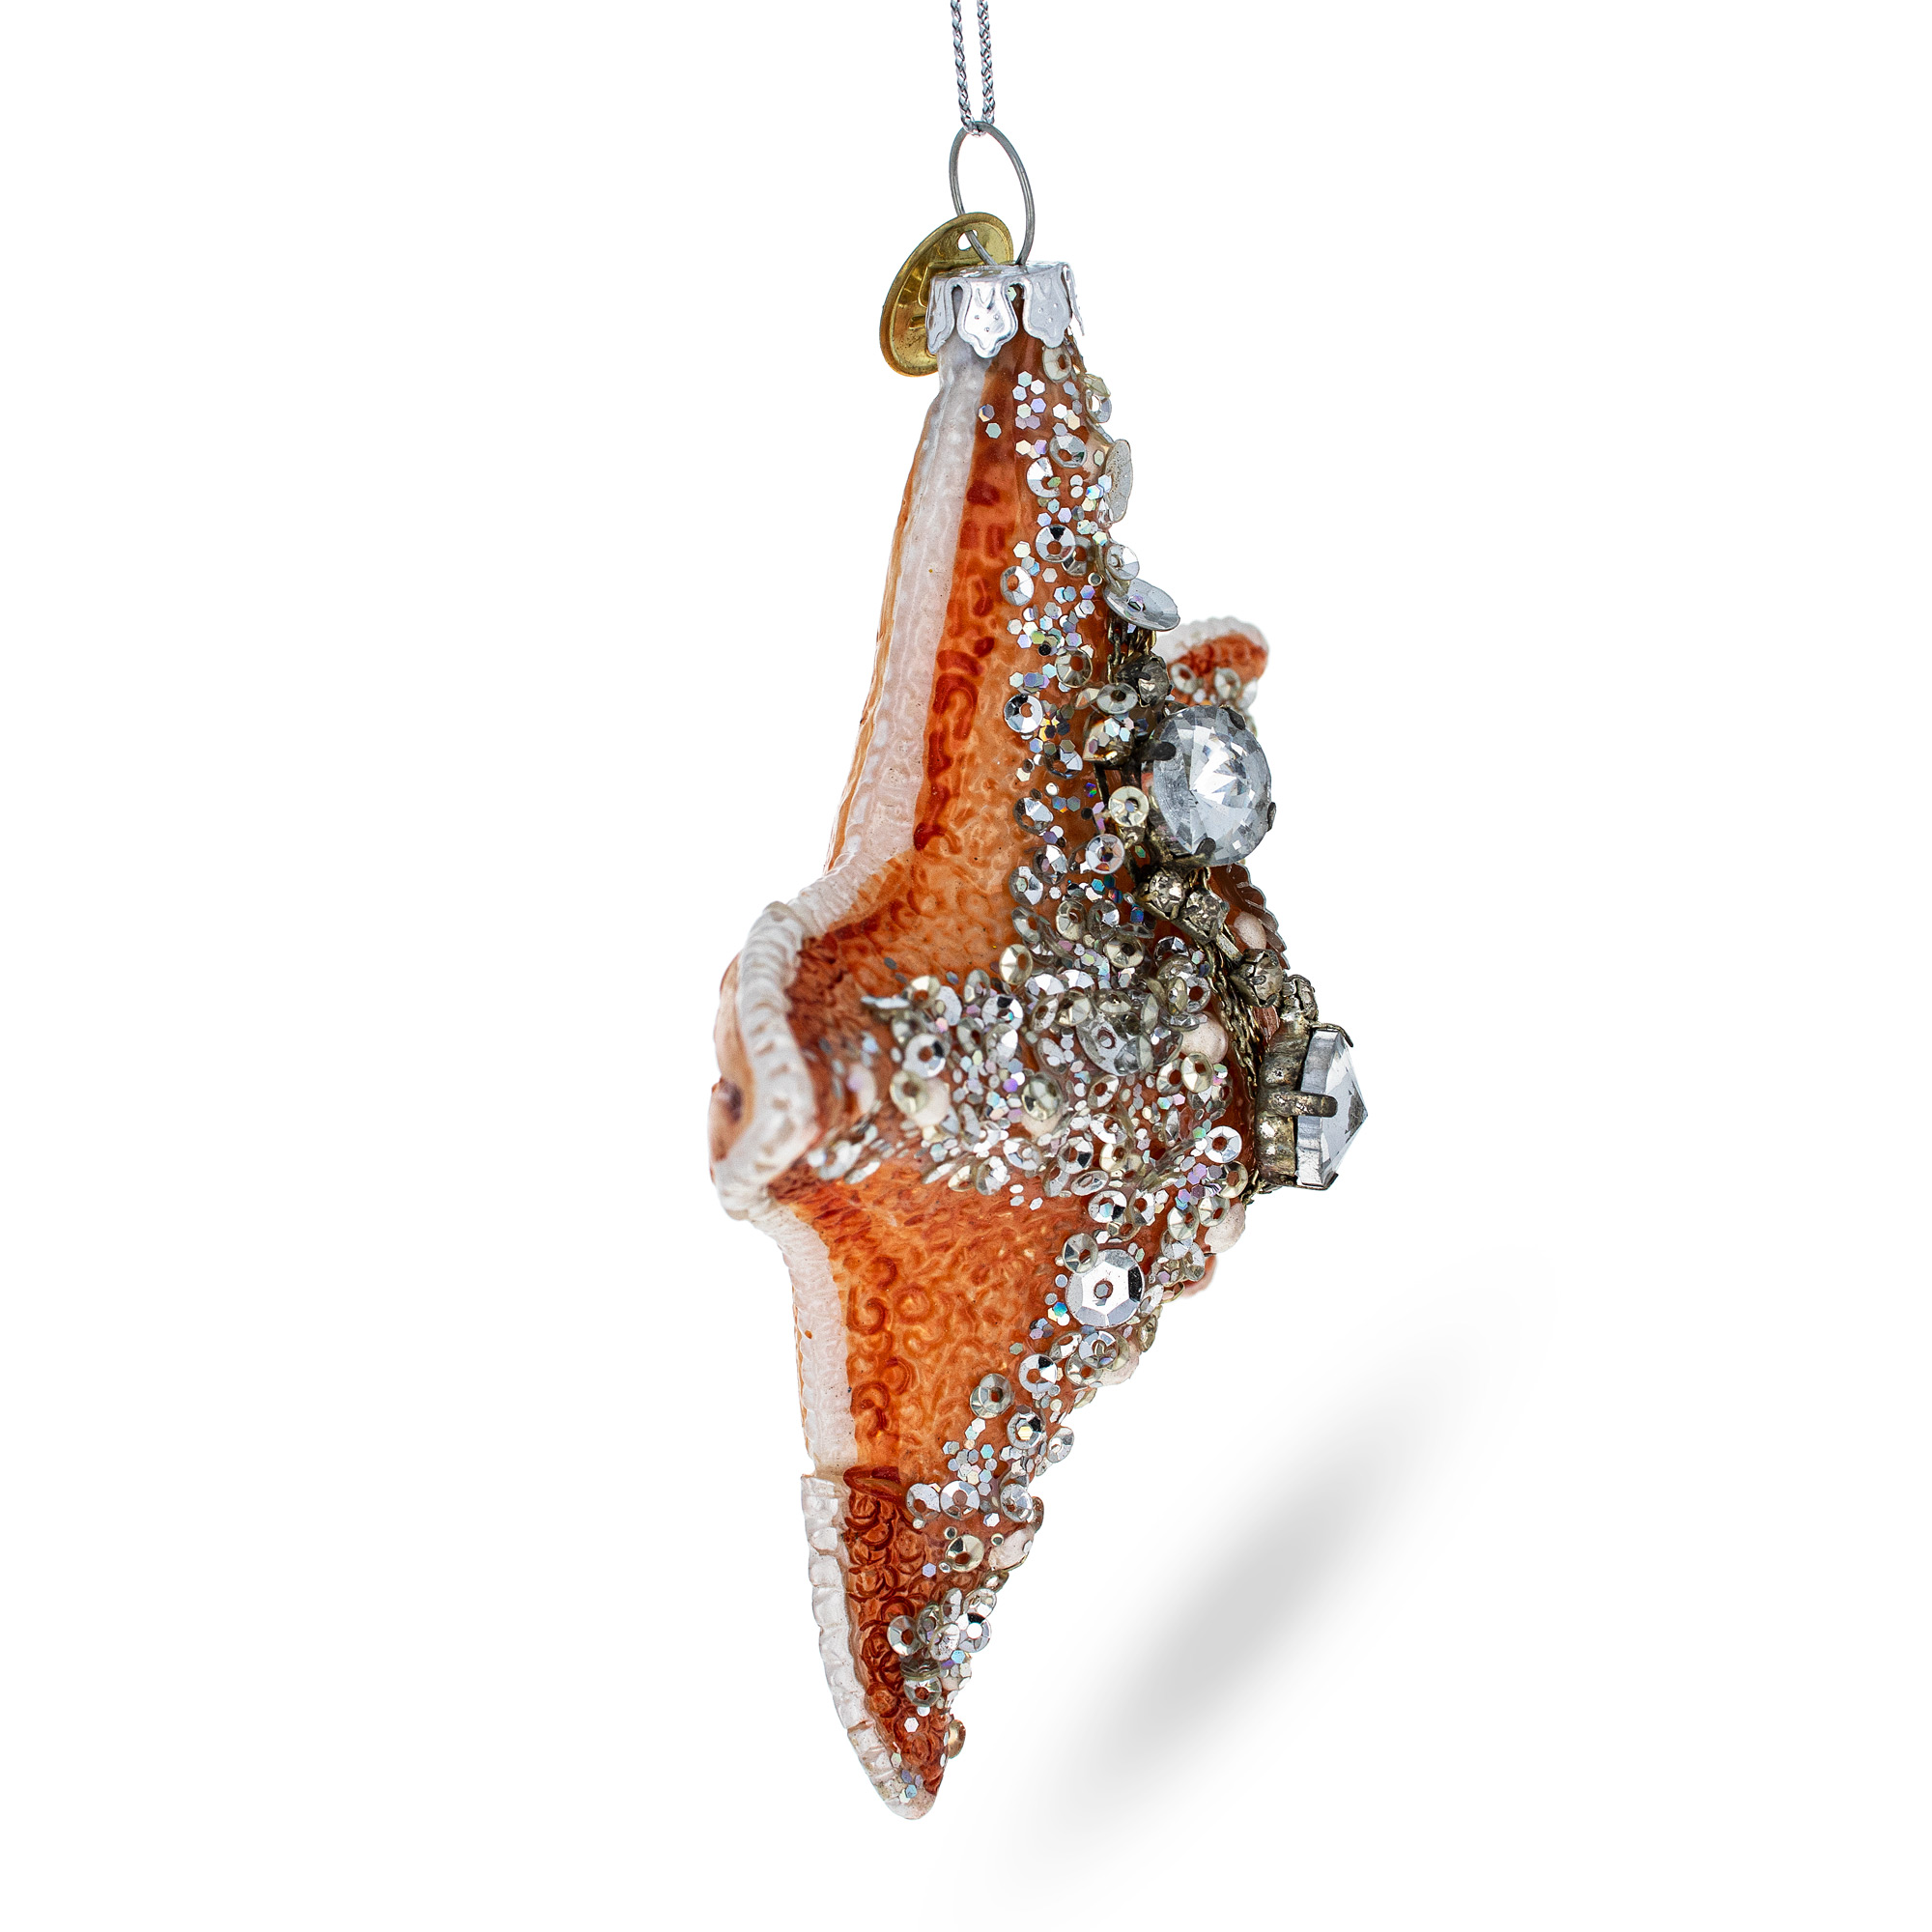 Glittered Starfish Blown Glass Christmas Ornament